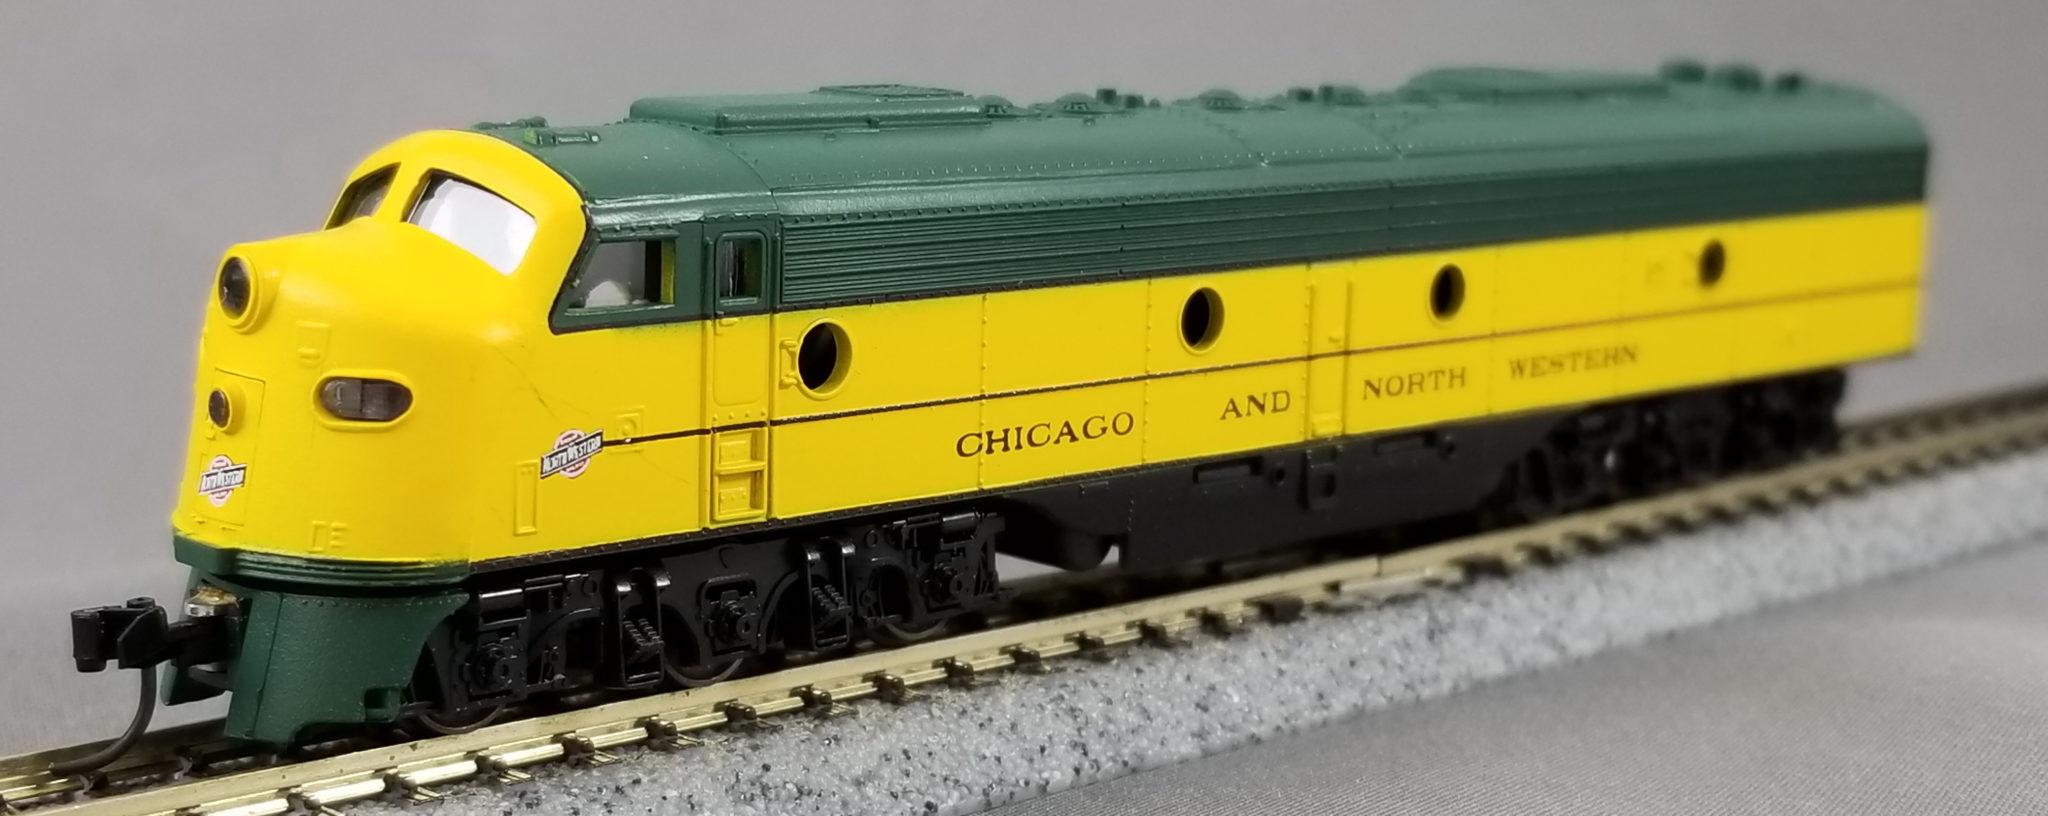 N Scale - Con-Cor - 0001-2743(01) - Locomotive, Diesel, EMD E8 - Chicago & North Western - 5008A